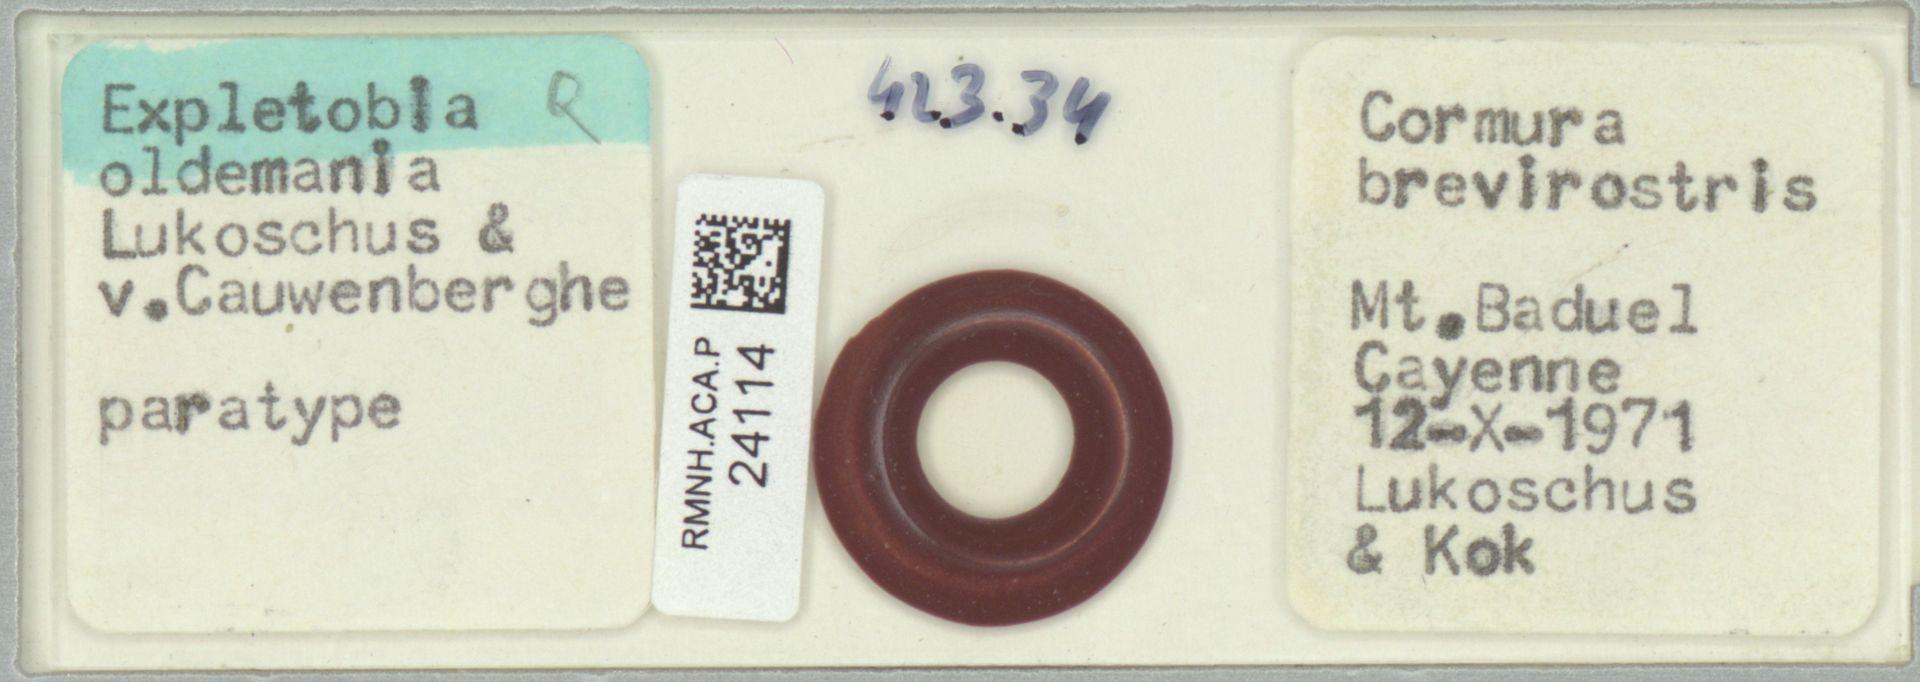 RMNH.ACA.P.24114 | Expletobia oldemania Lukoschus & v.Cauwenberghe